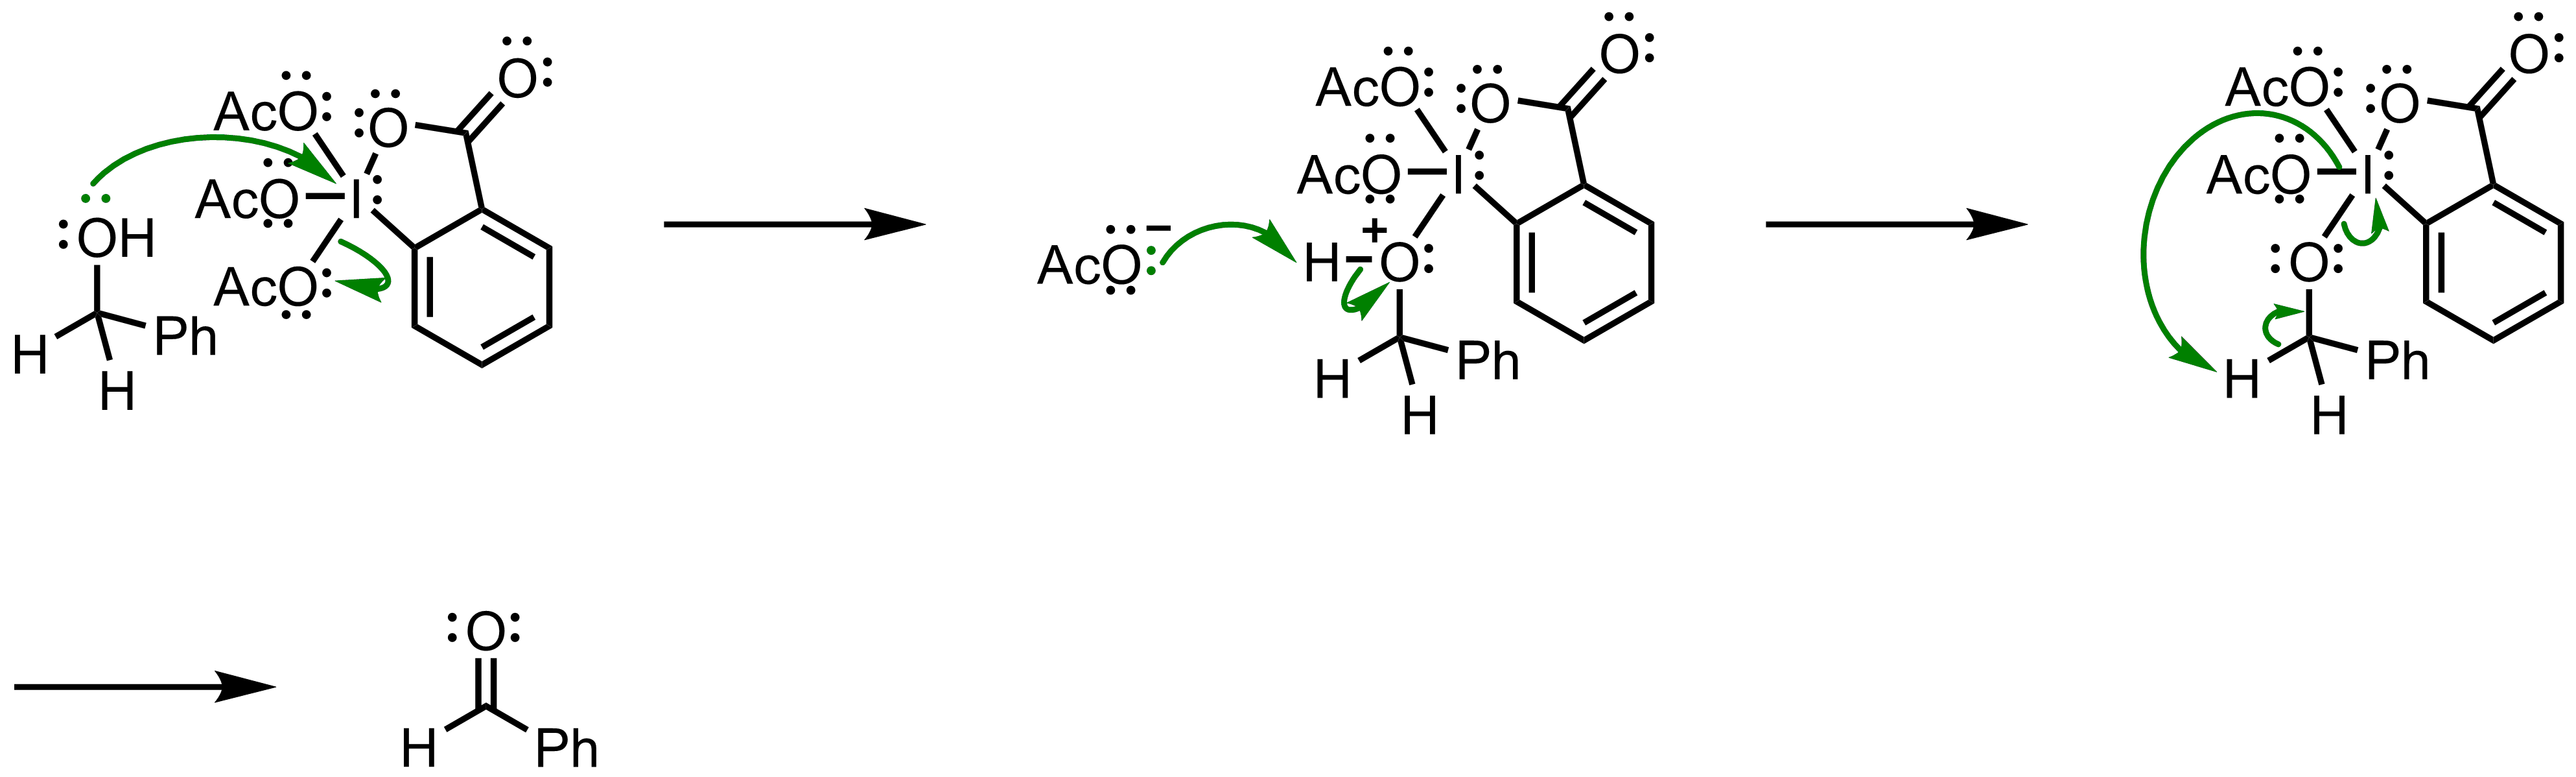 Mechanism of the Dess-Martin Oxidation